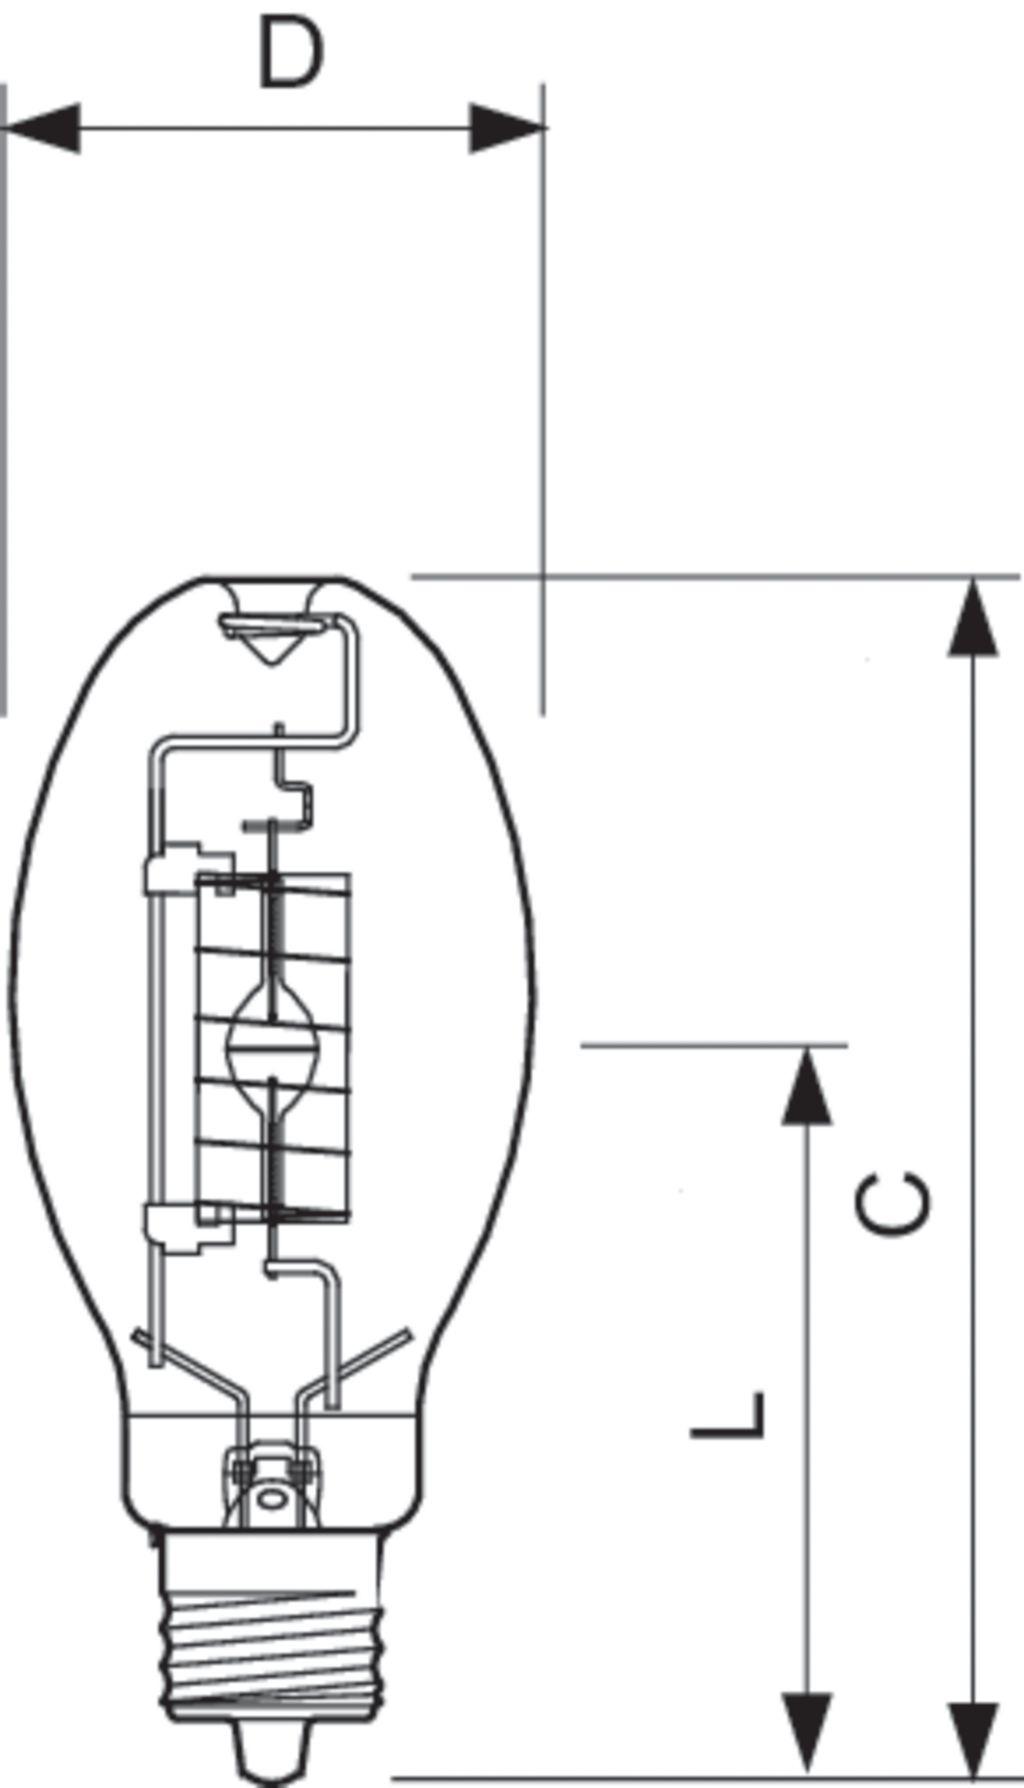 Philips Lighting Energy Advantage Metal Halide Lamp